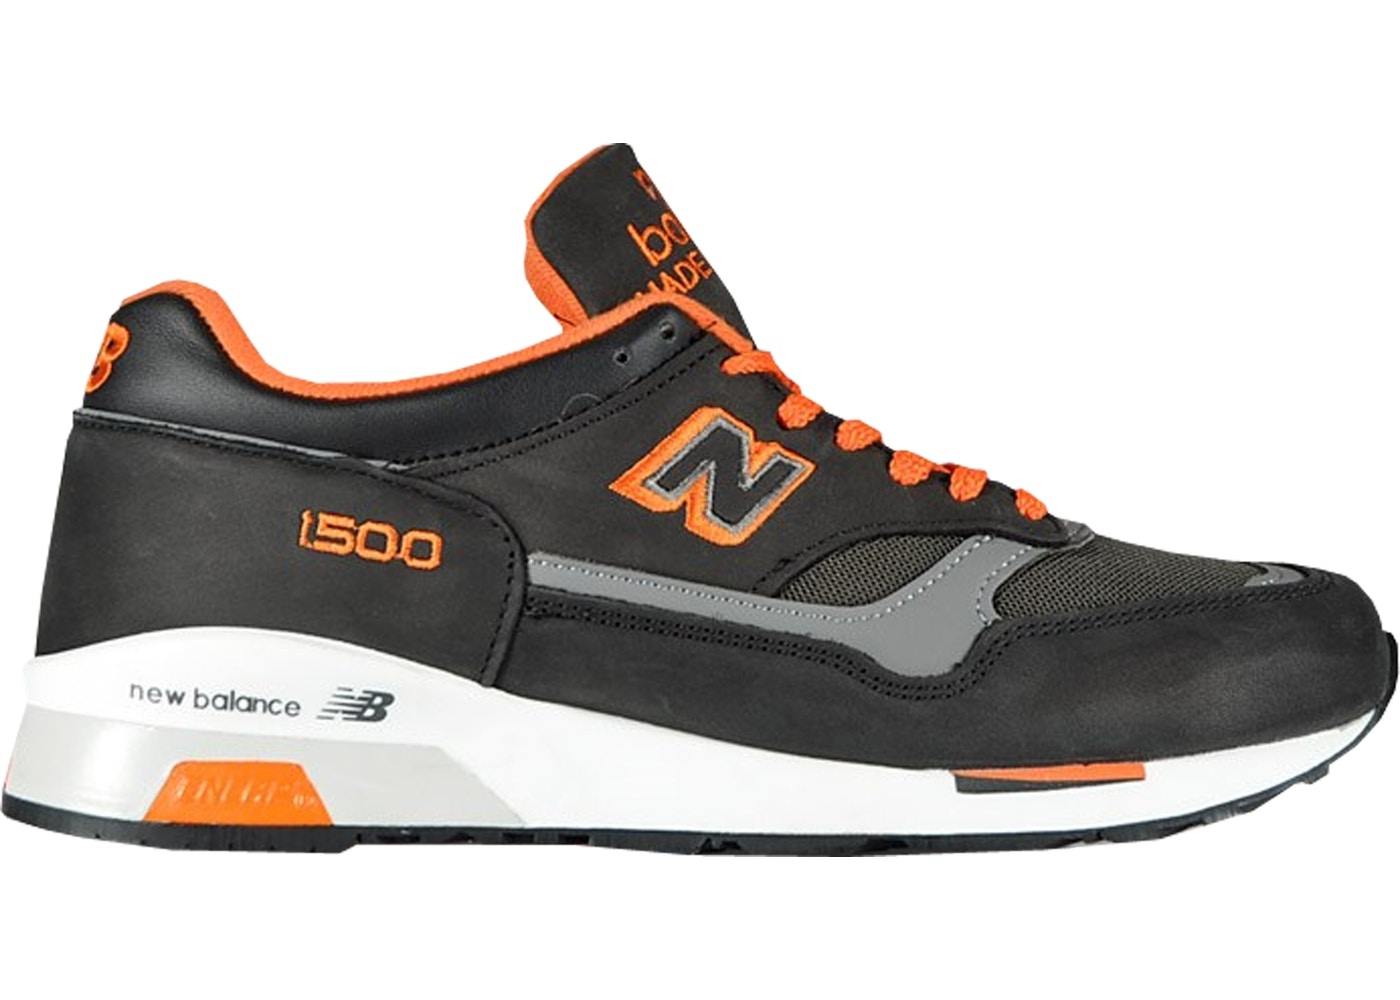 New Balance 1500 Anthracite Grey Orange a089d7536d3a